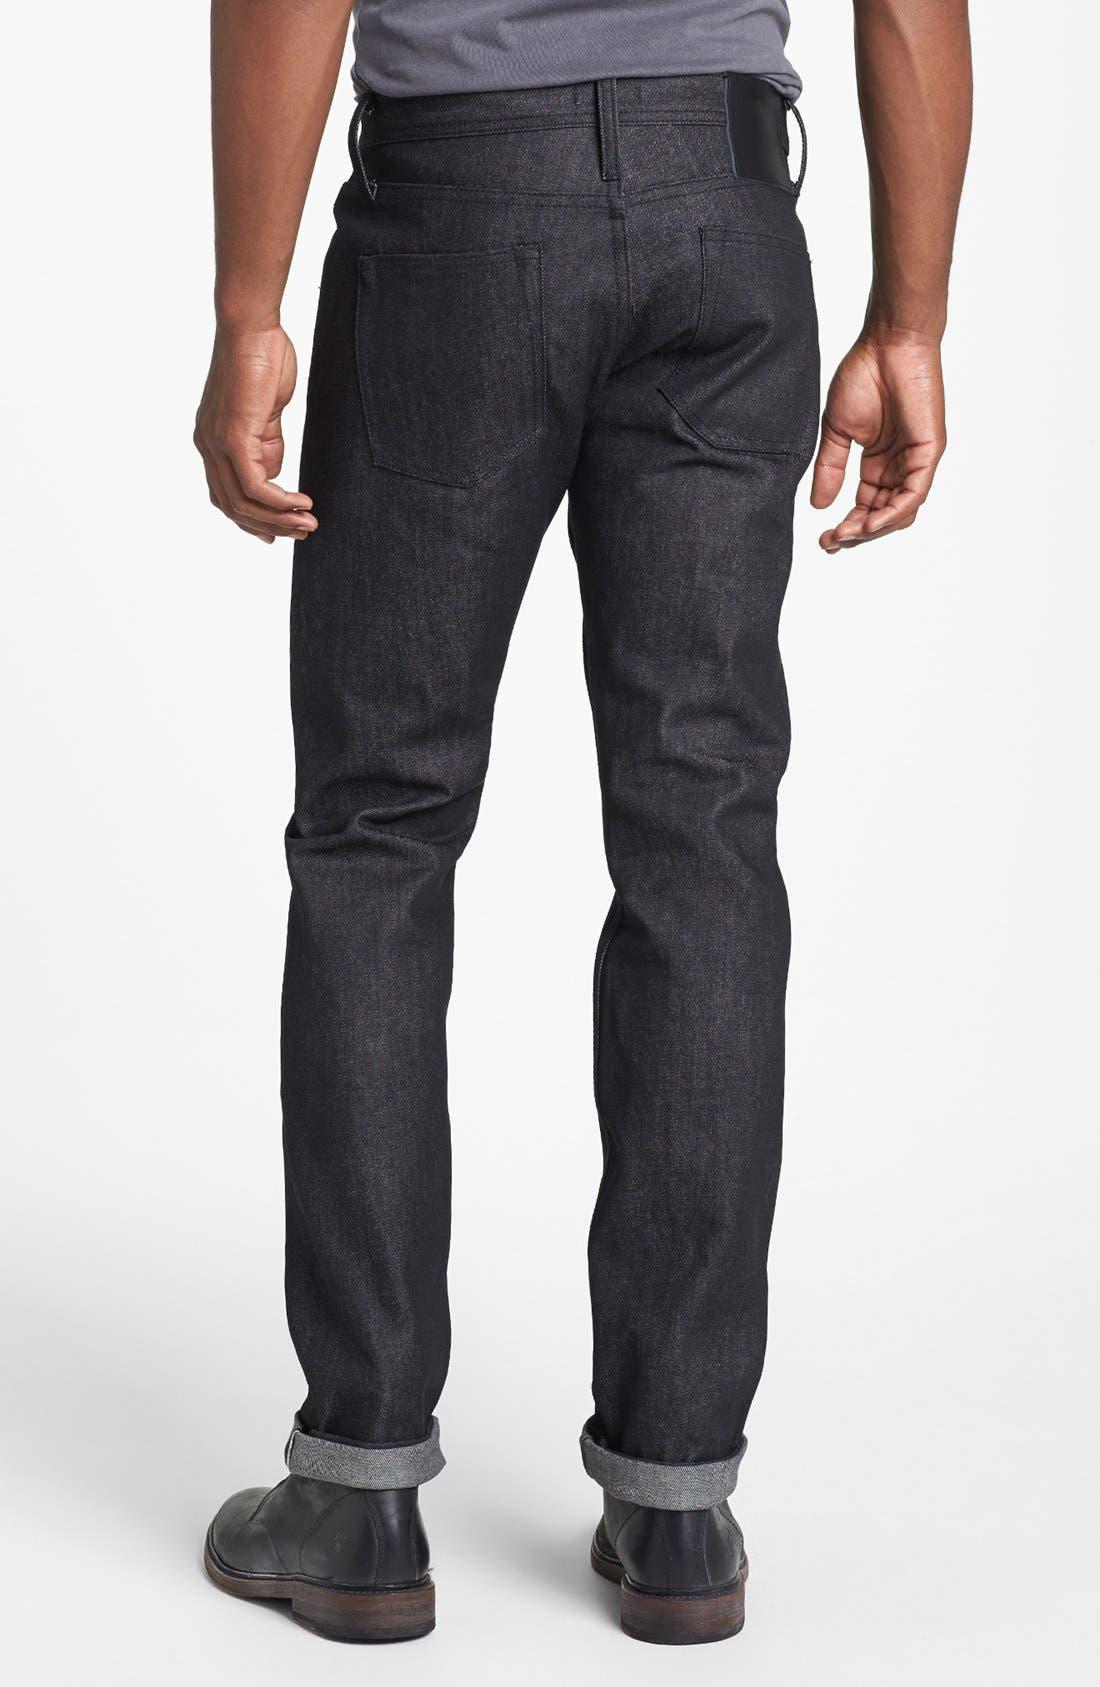 Alternate Image 1 Selected - The Unbranded Brand Skinny Fit Selvedge Jeans (Black)